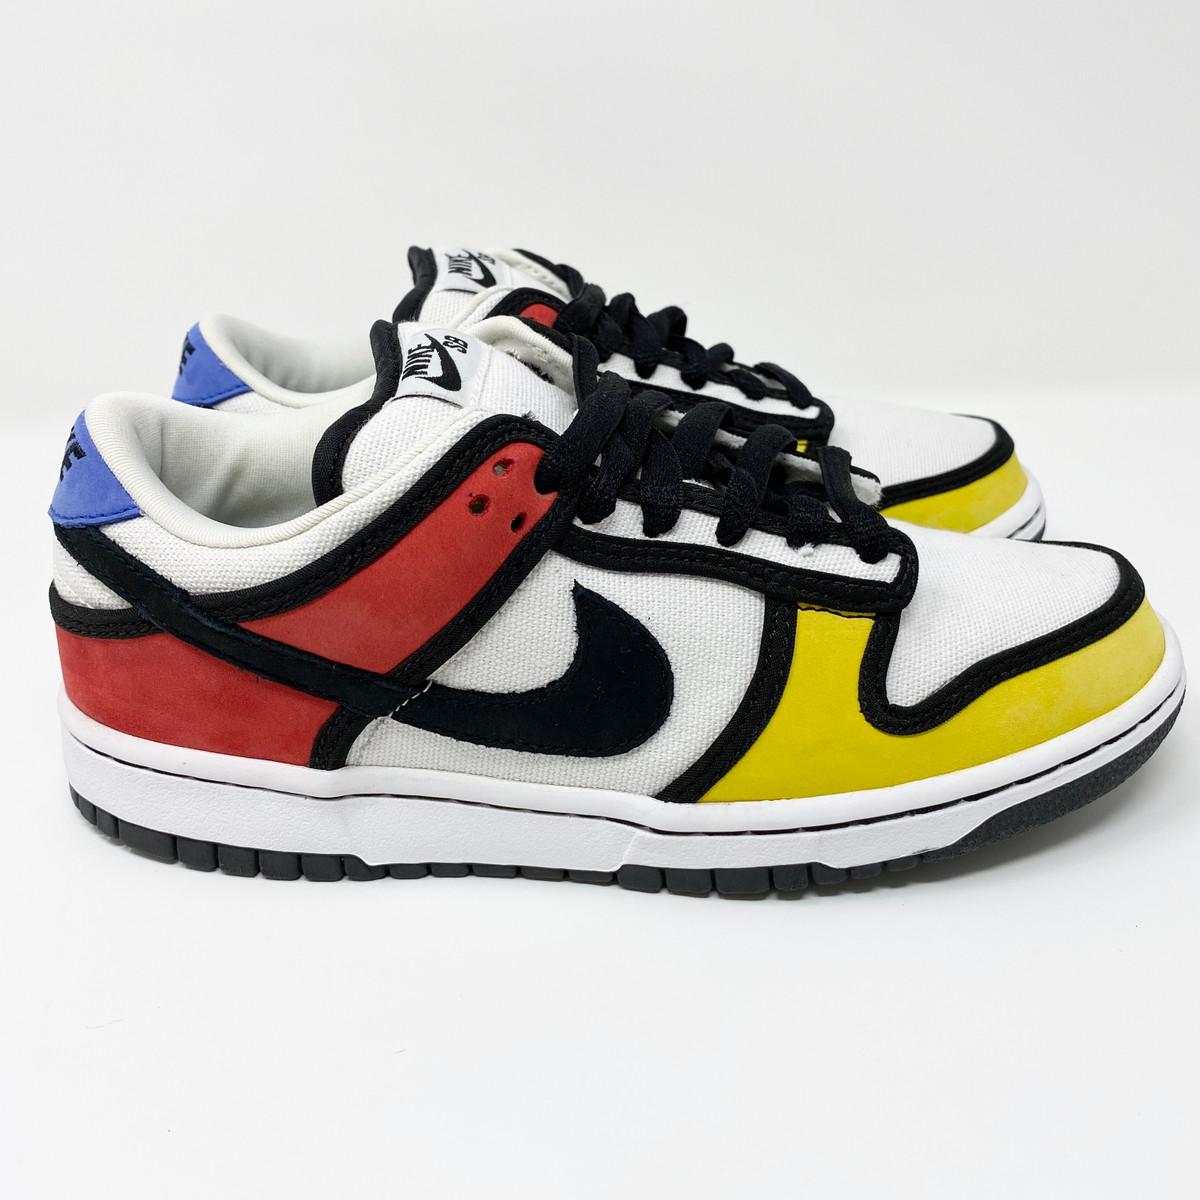 Nike Dunk Low Pro SB Piet Mondrian